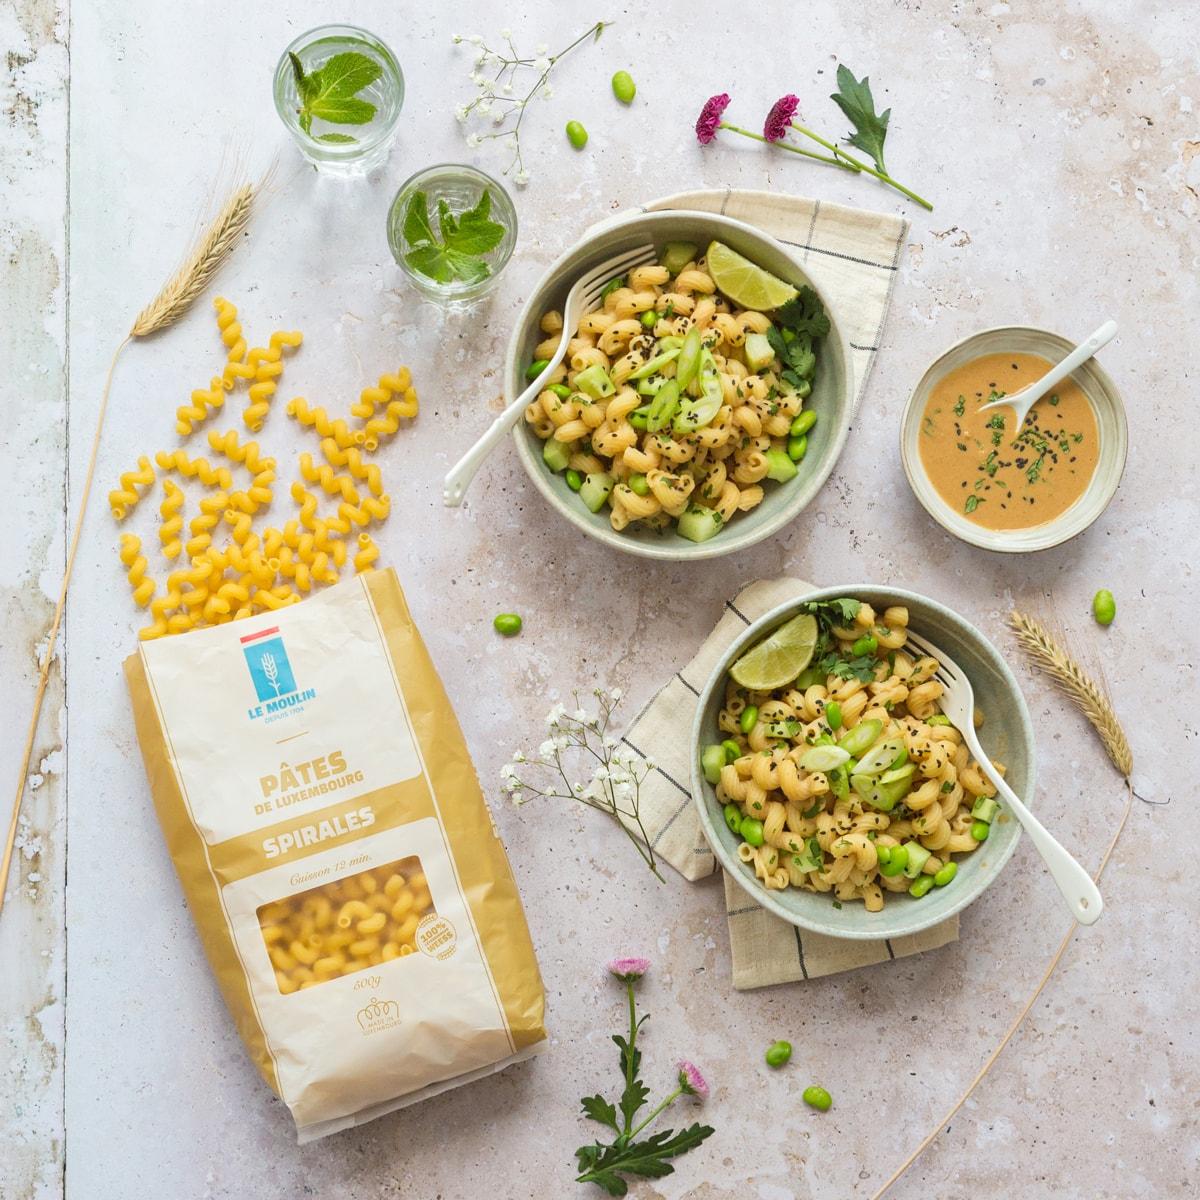 Le Moulin - Recettes - Asian pasta salad with peanut butter